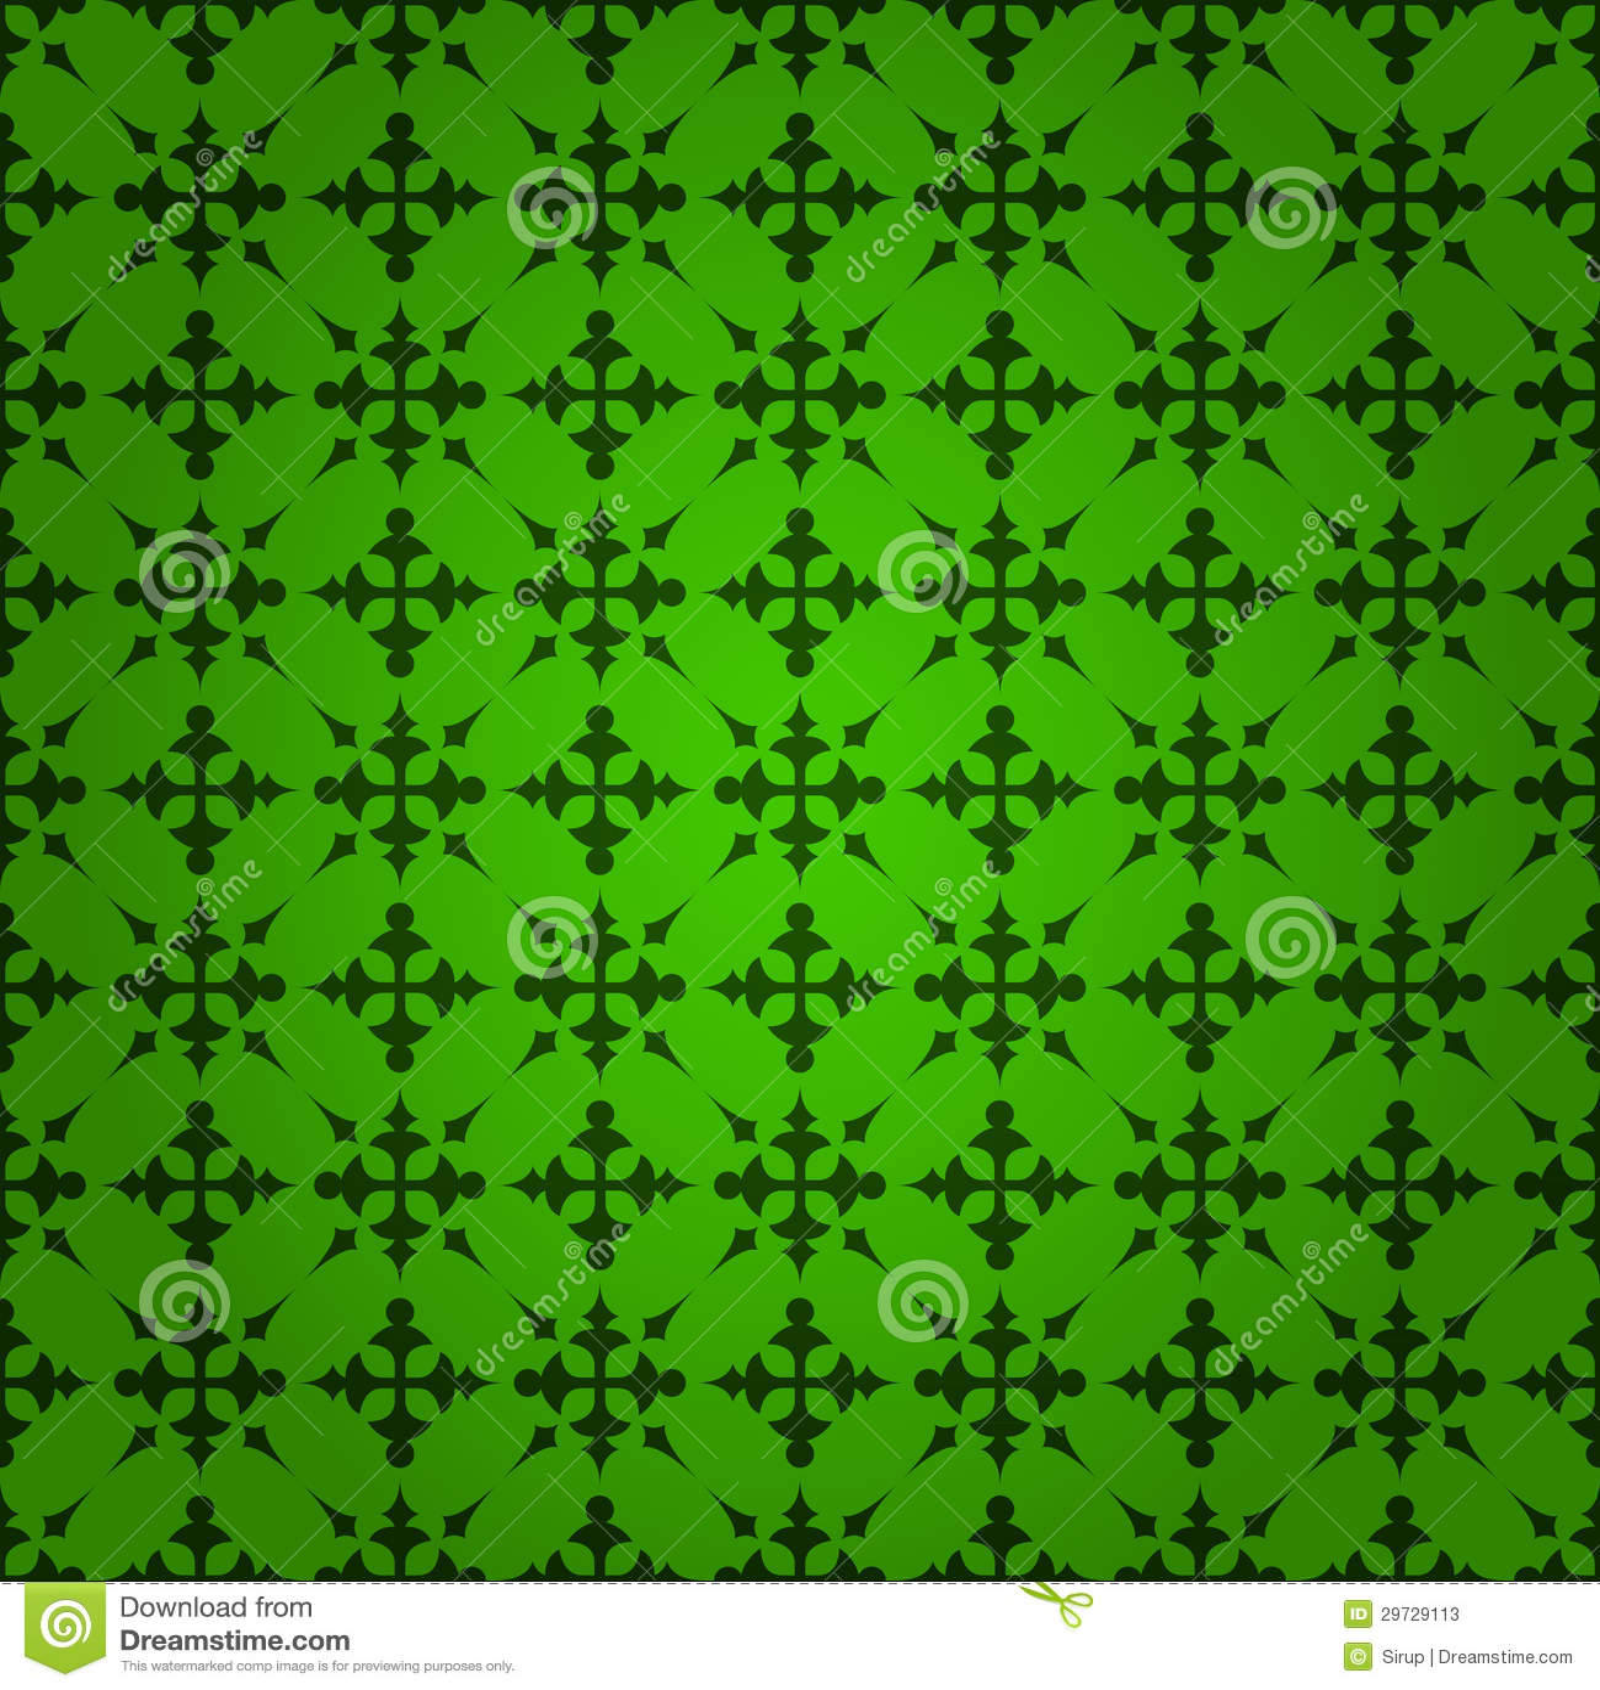 elegant green backgrounds - photo #22